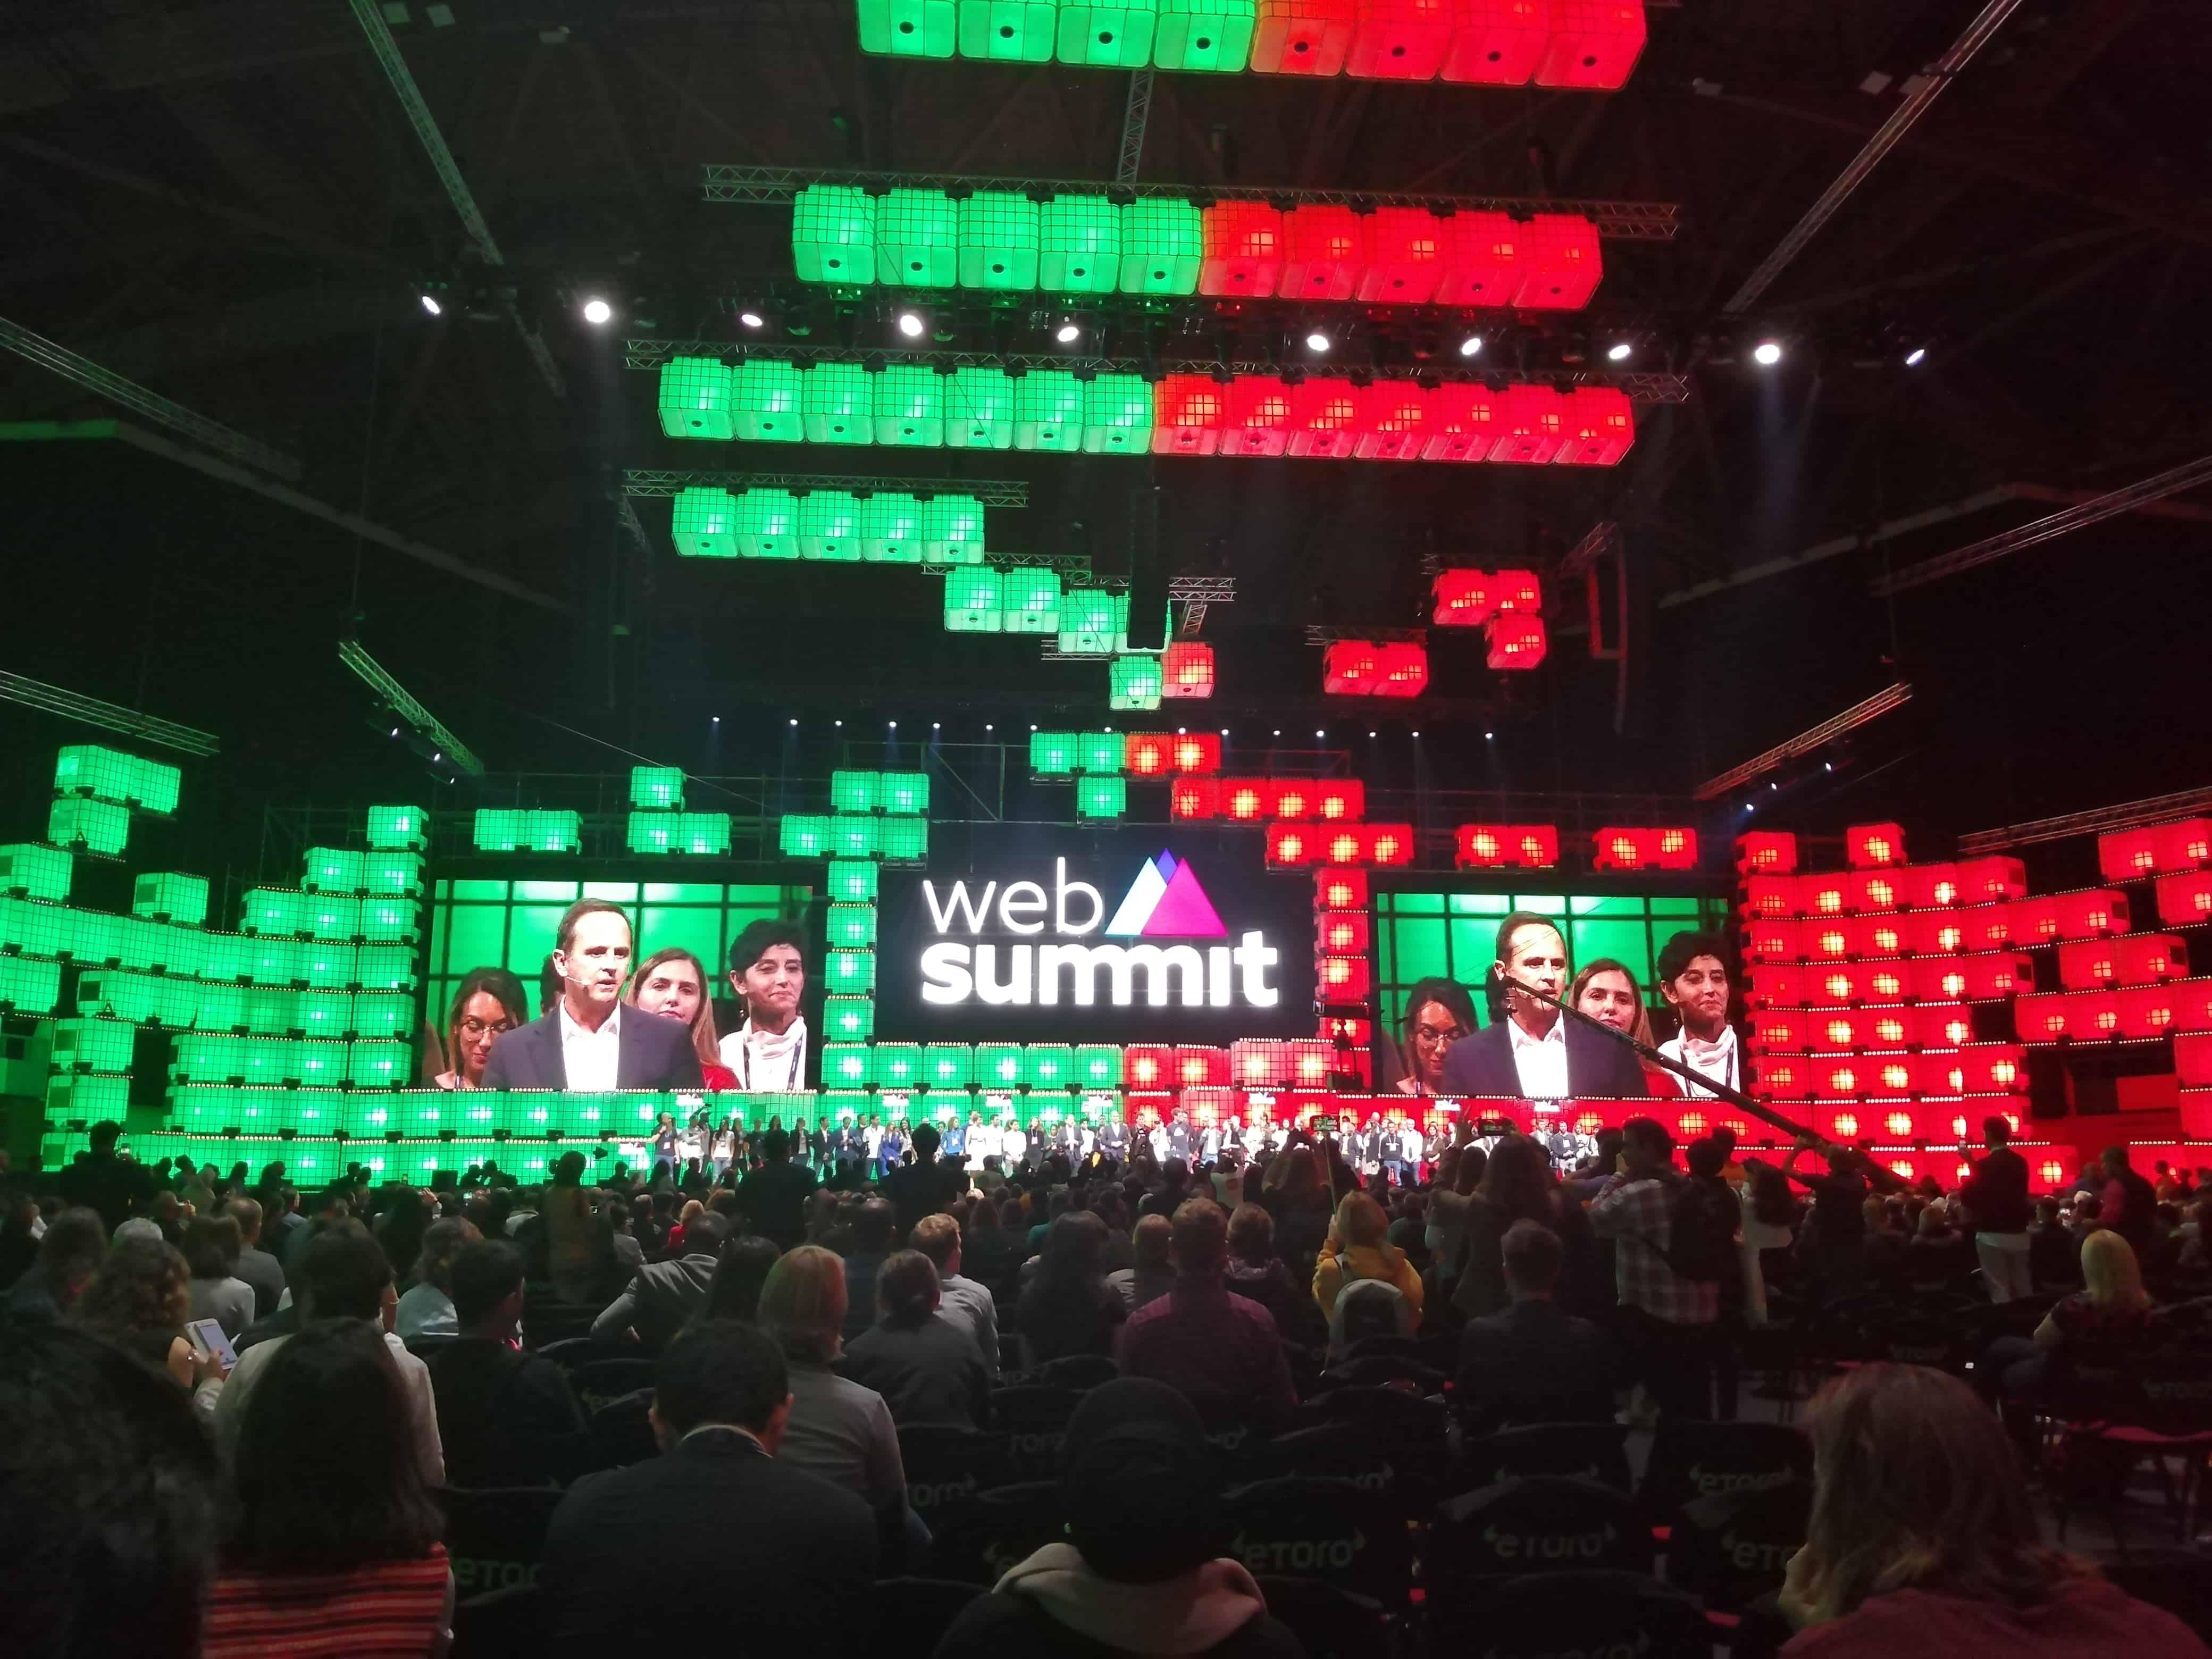 Fernando Medina - Mayor, City of Lisbon - Opening Night - Web Summit 2019